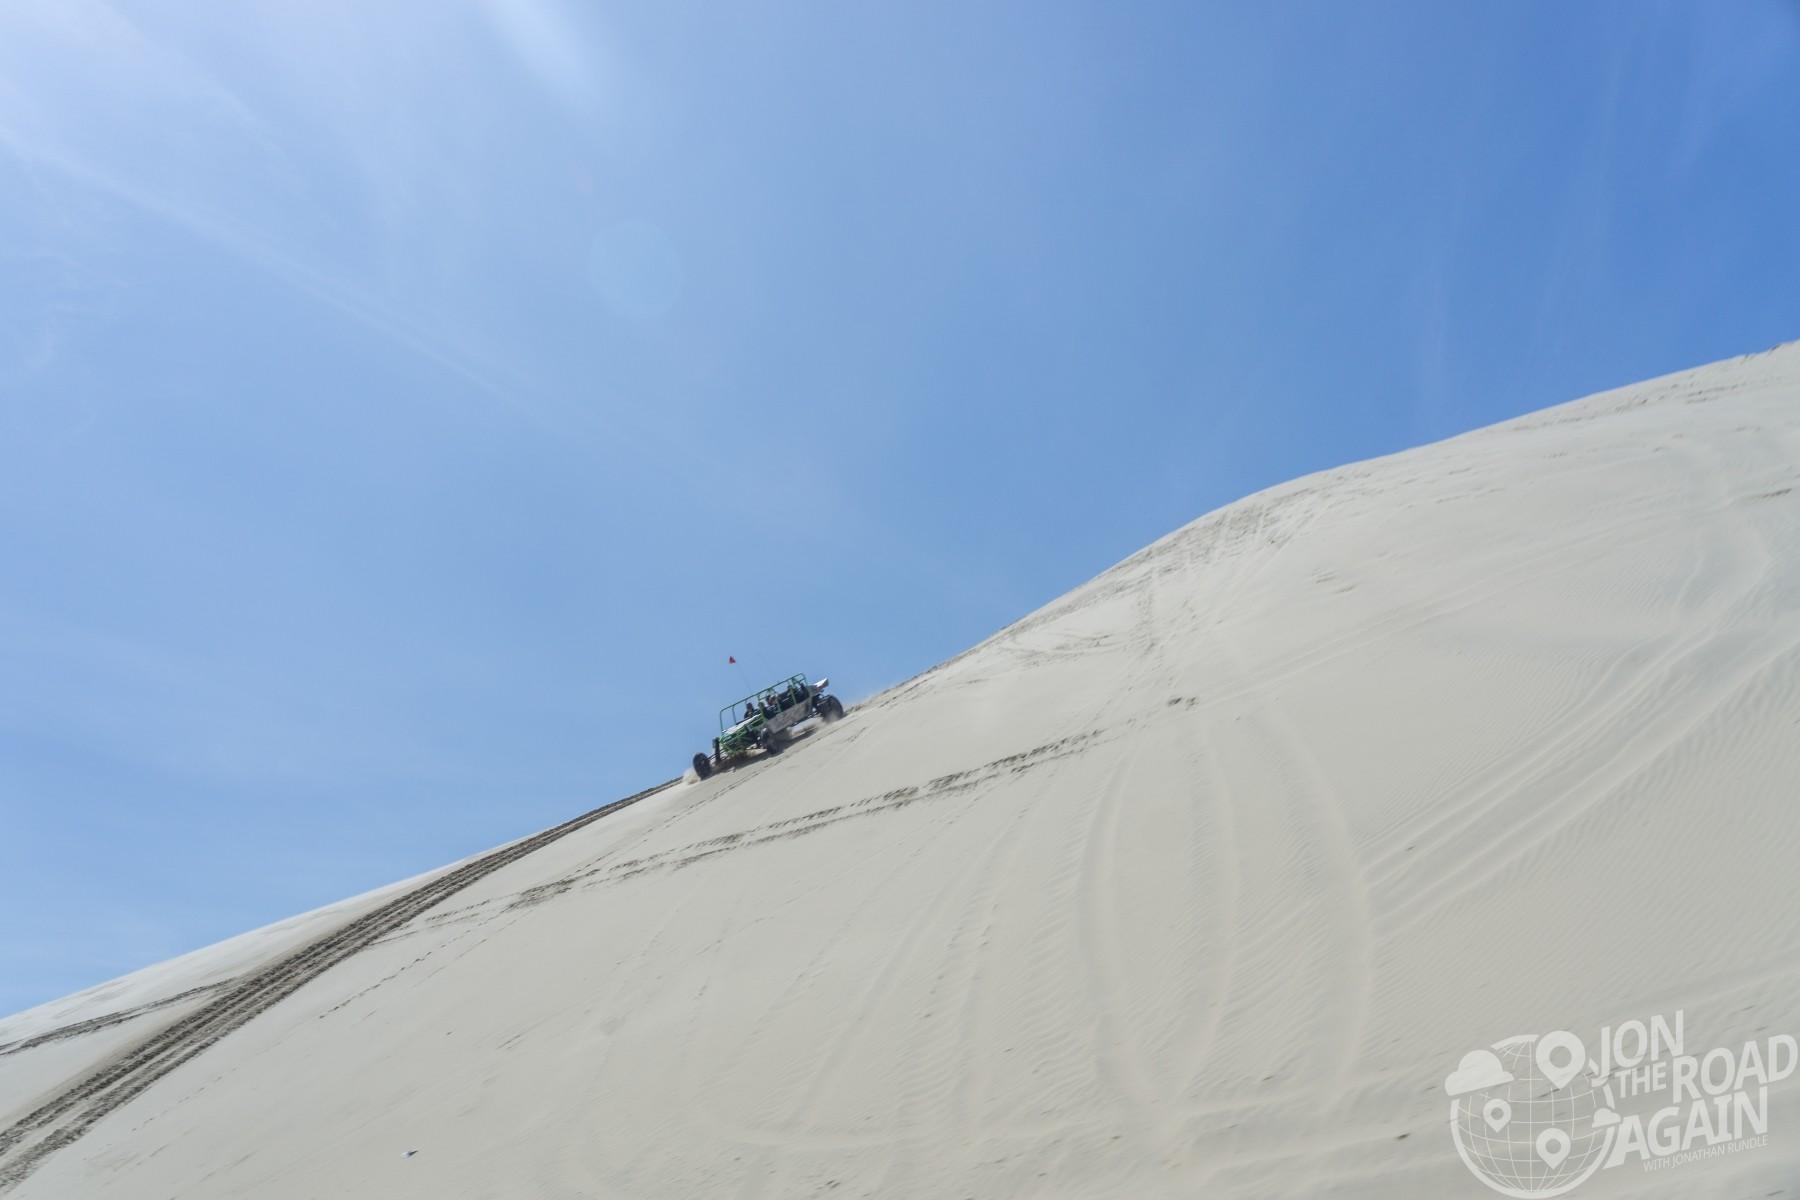 dune buggy at oregon dunes